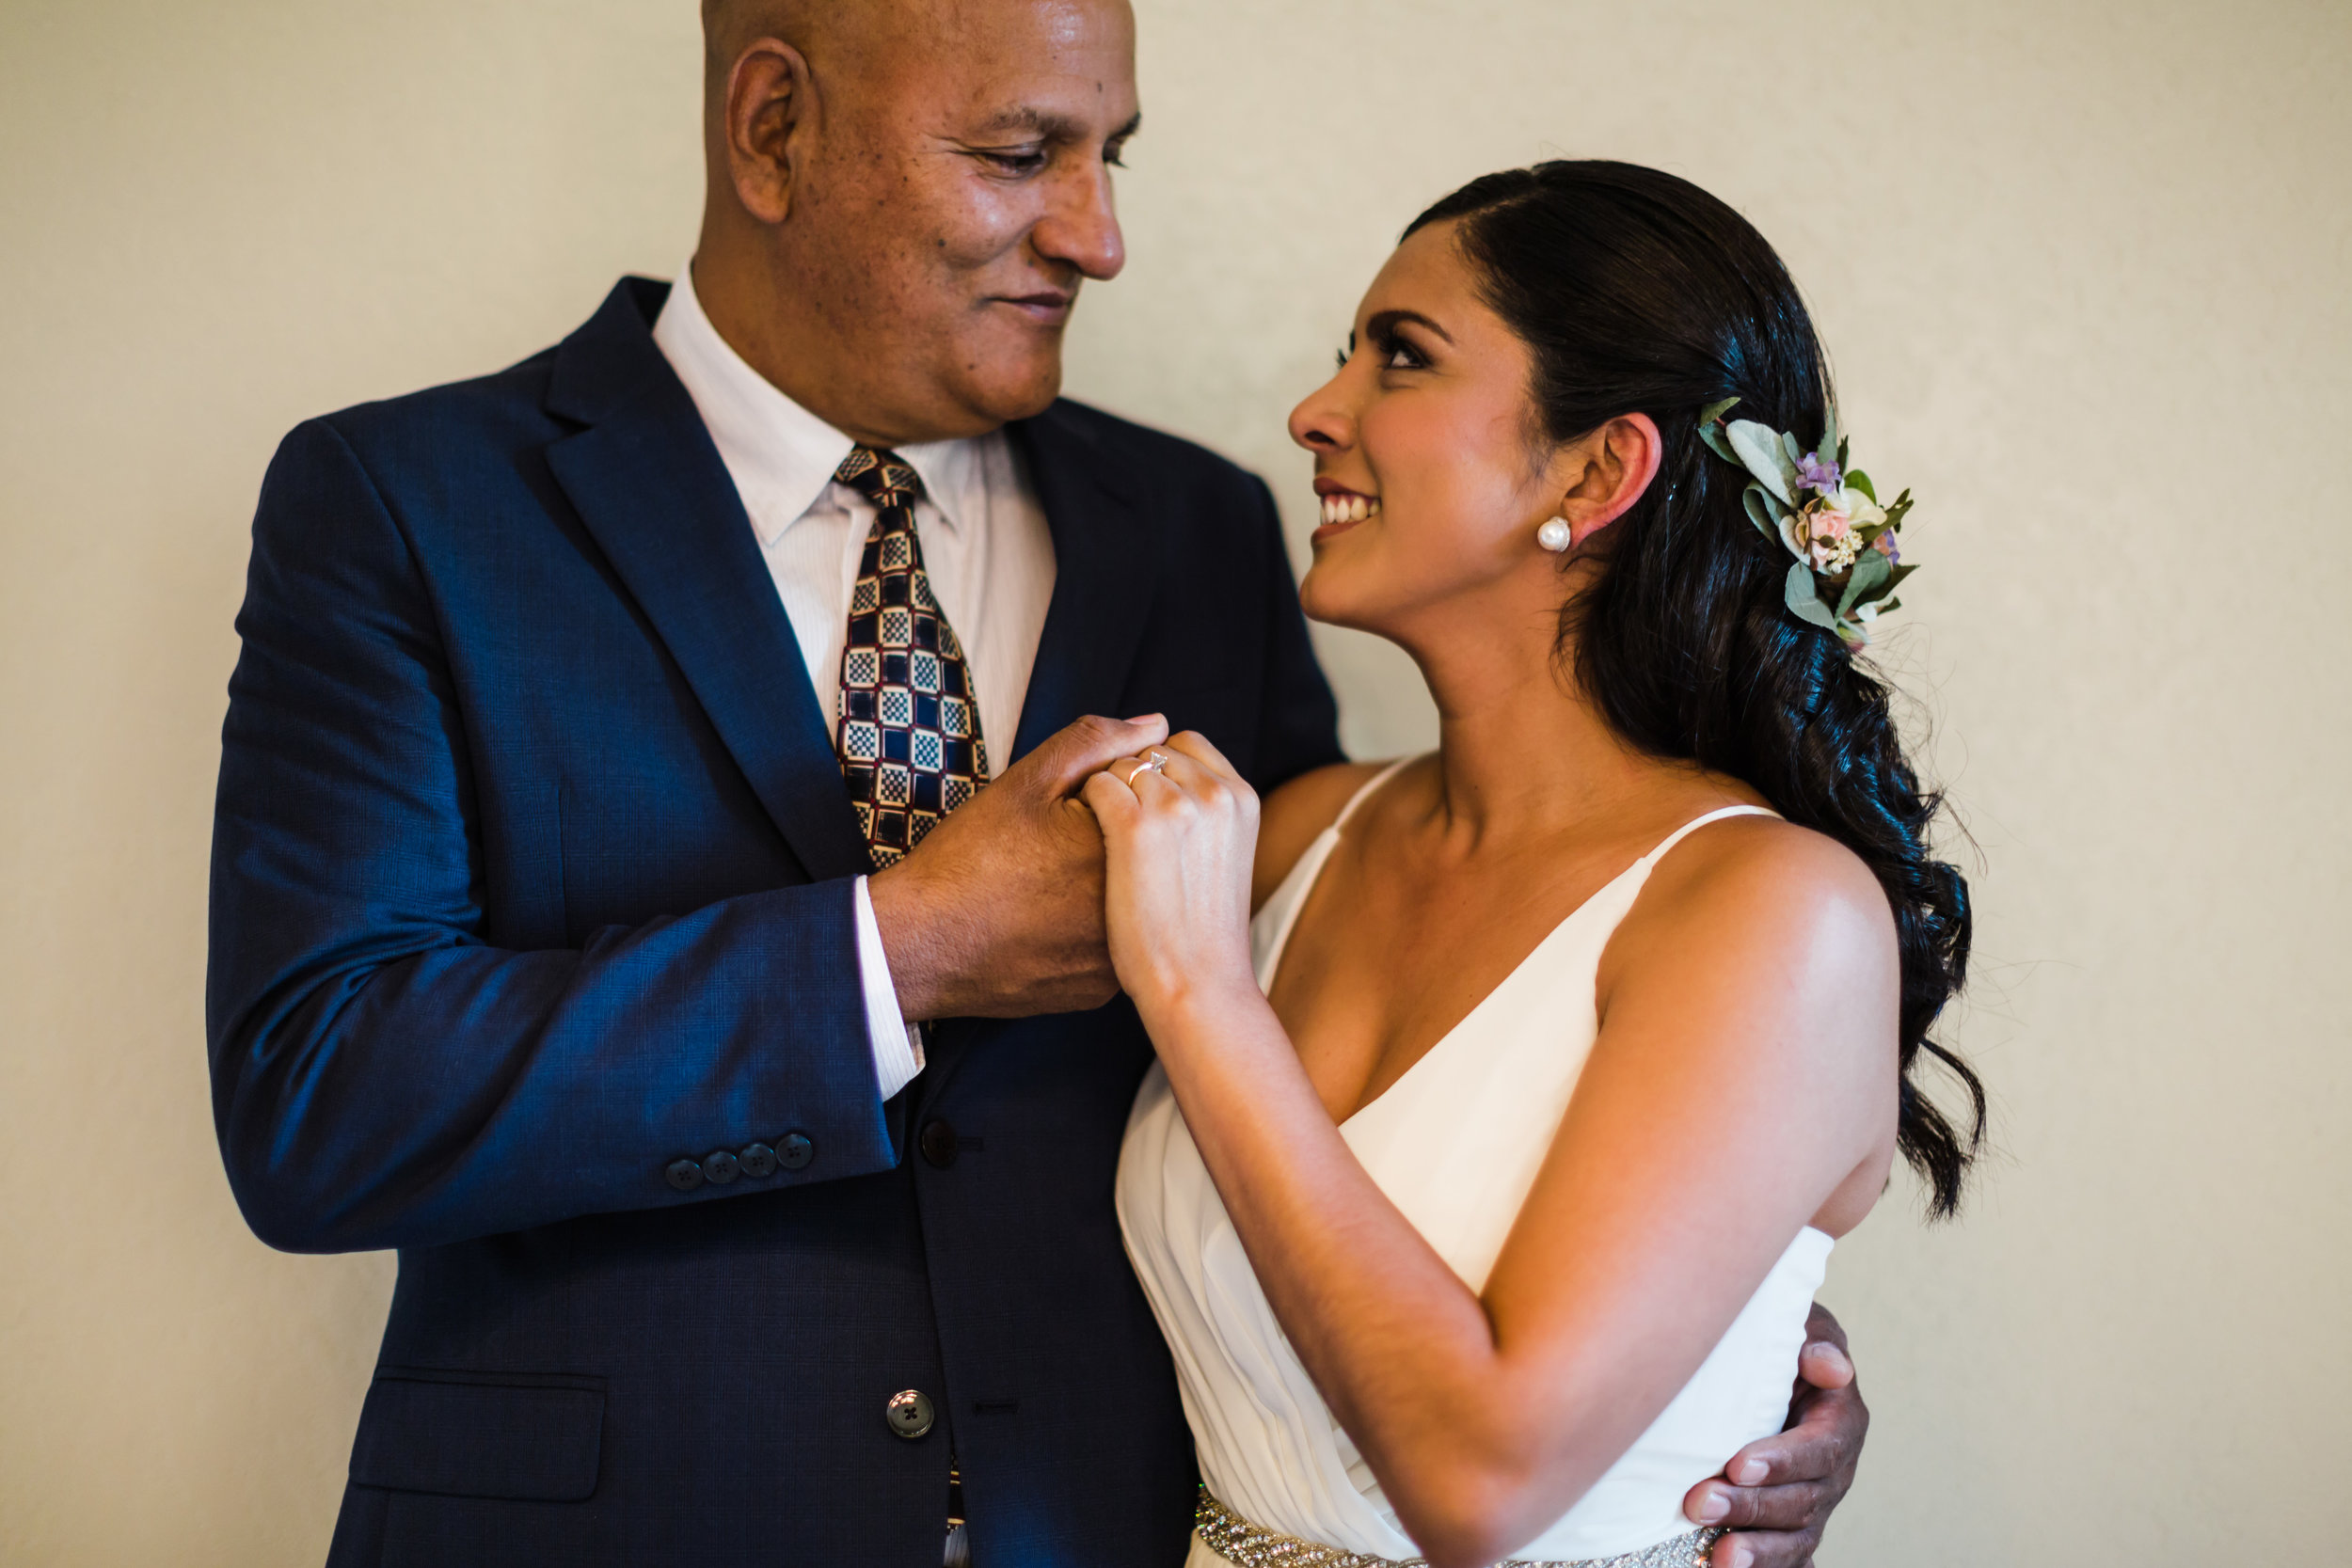 2018.11.03 Jael and Edel Ocala Wedding FINALS (180 of 441).jpg